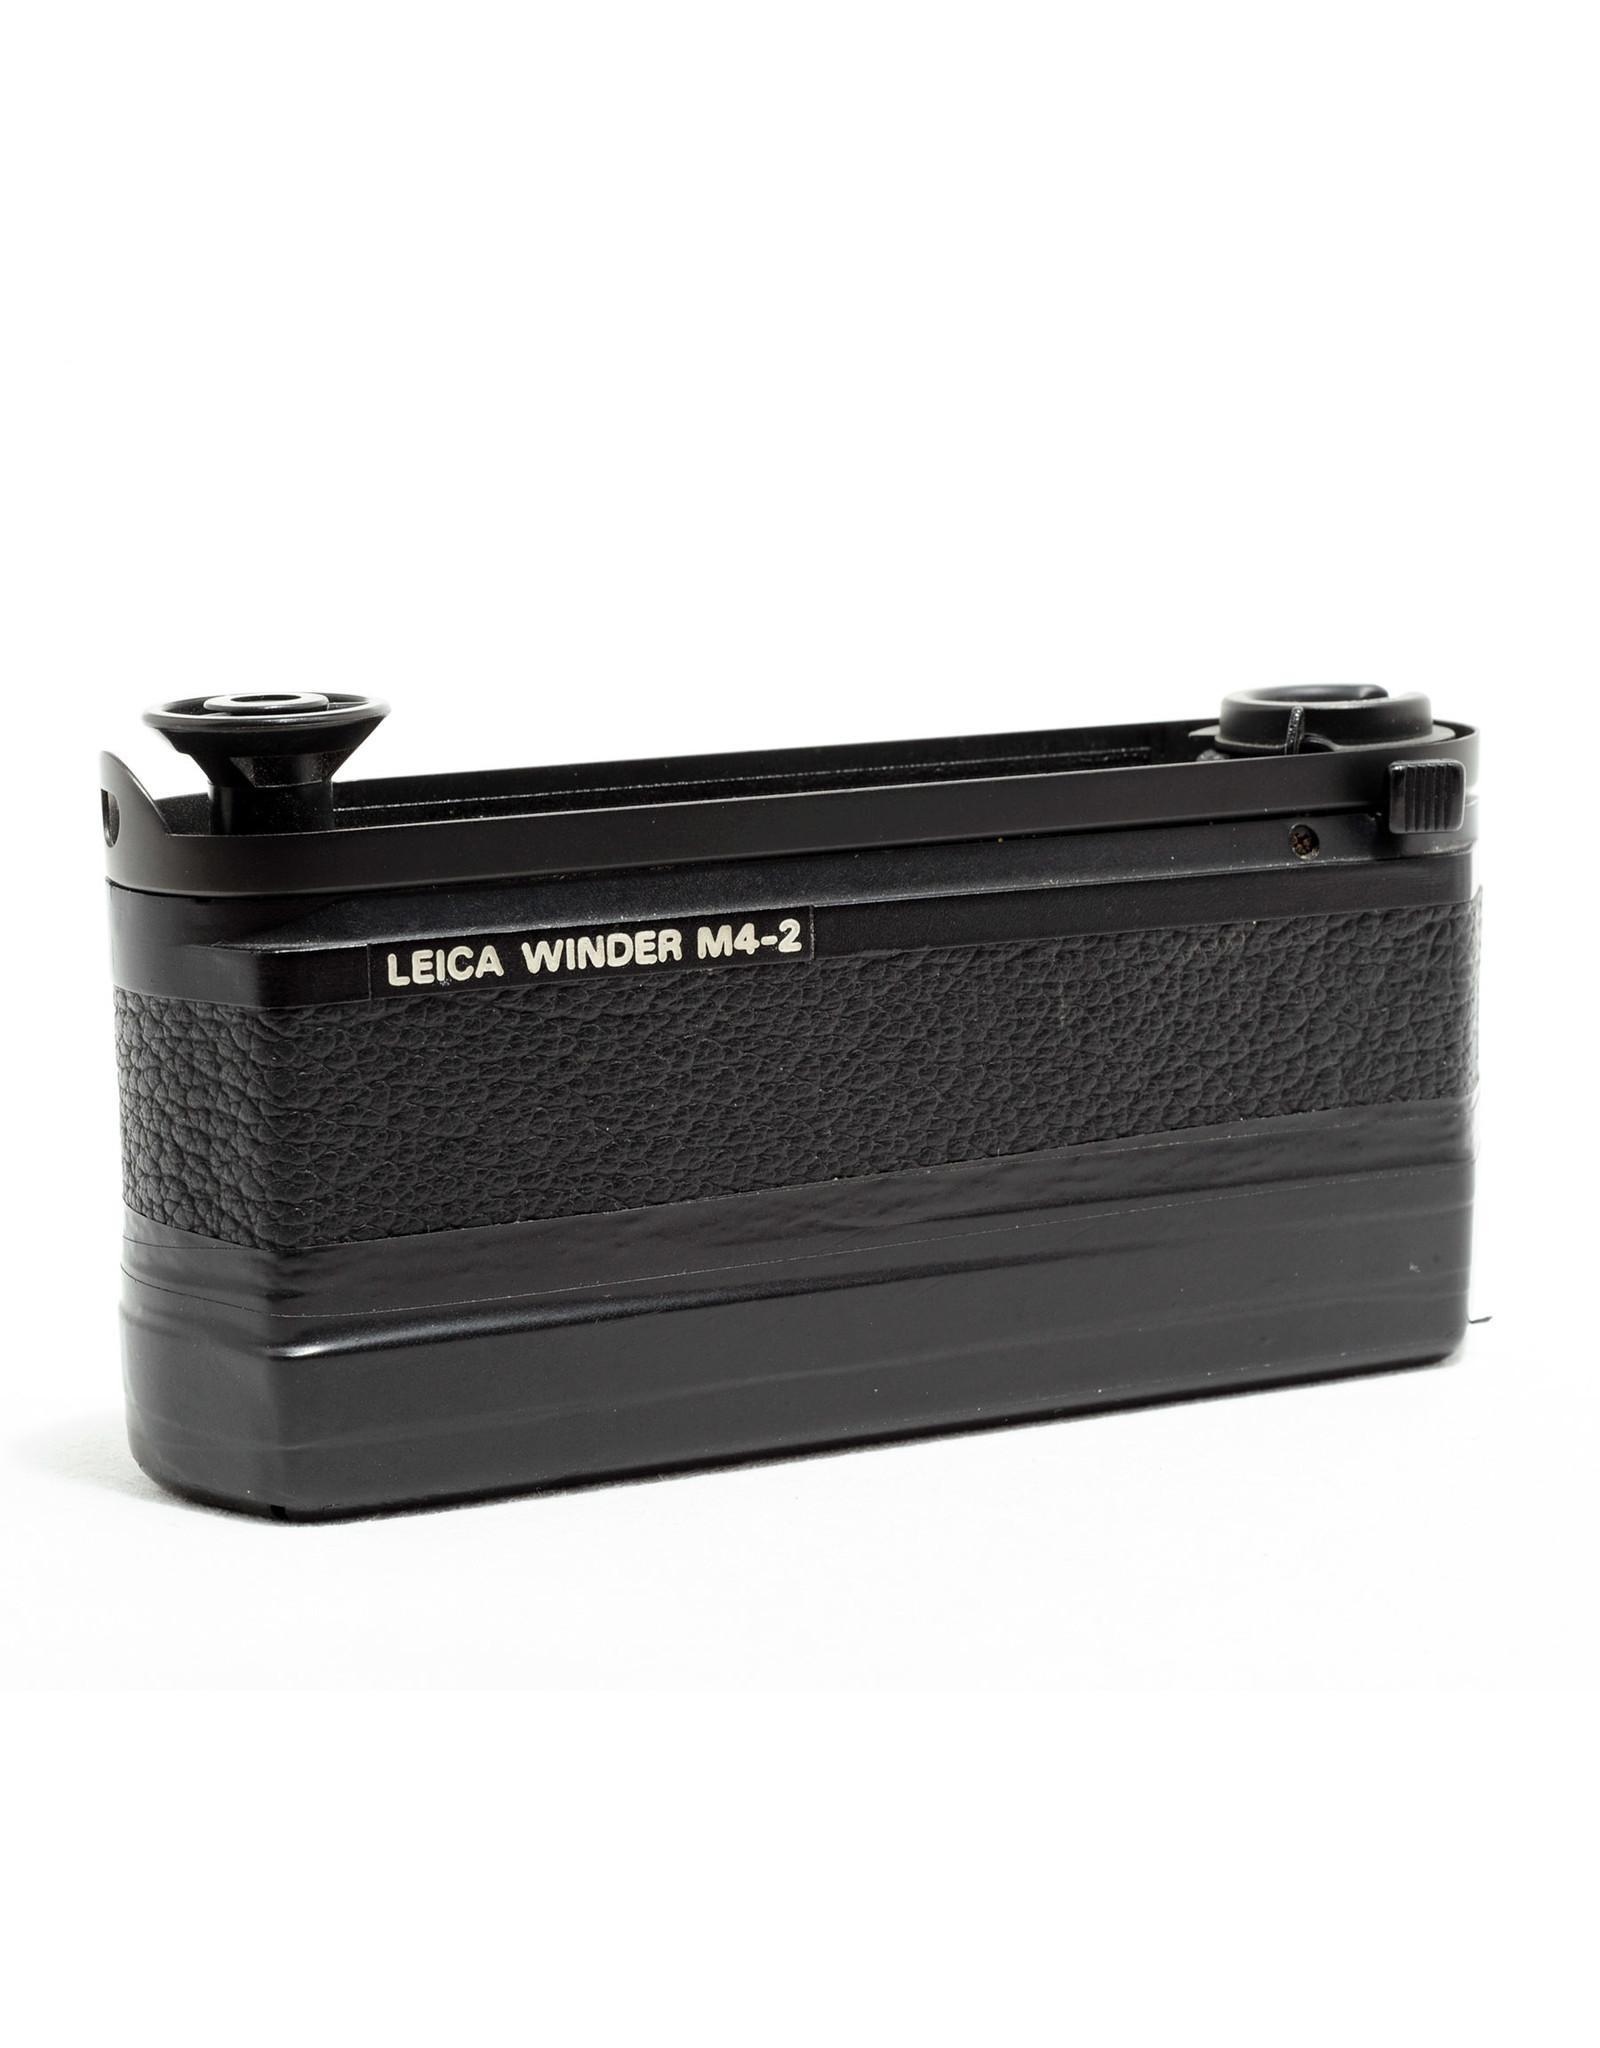 Leica Leica Winder M4-2